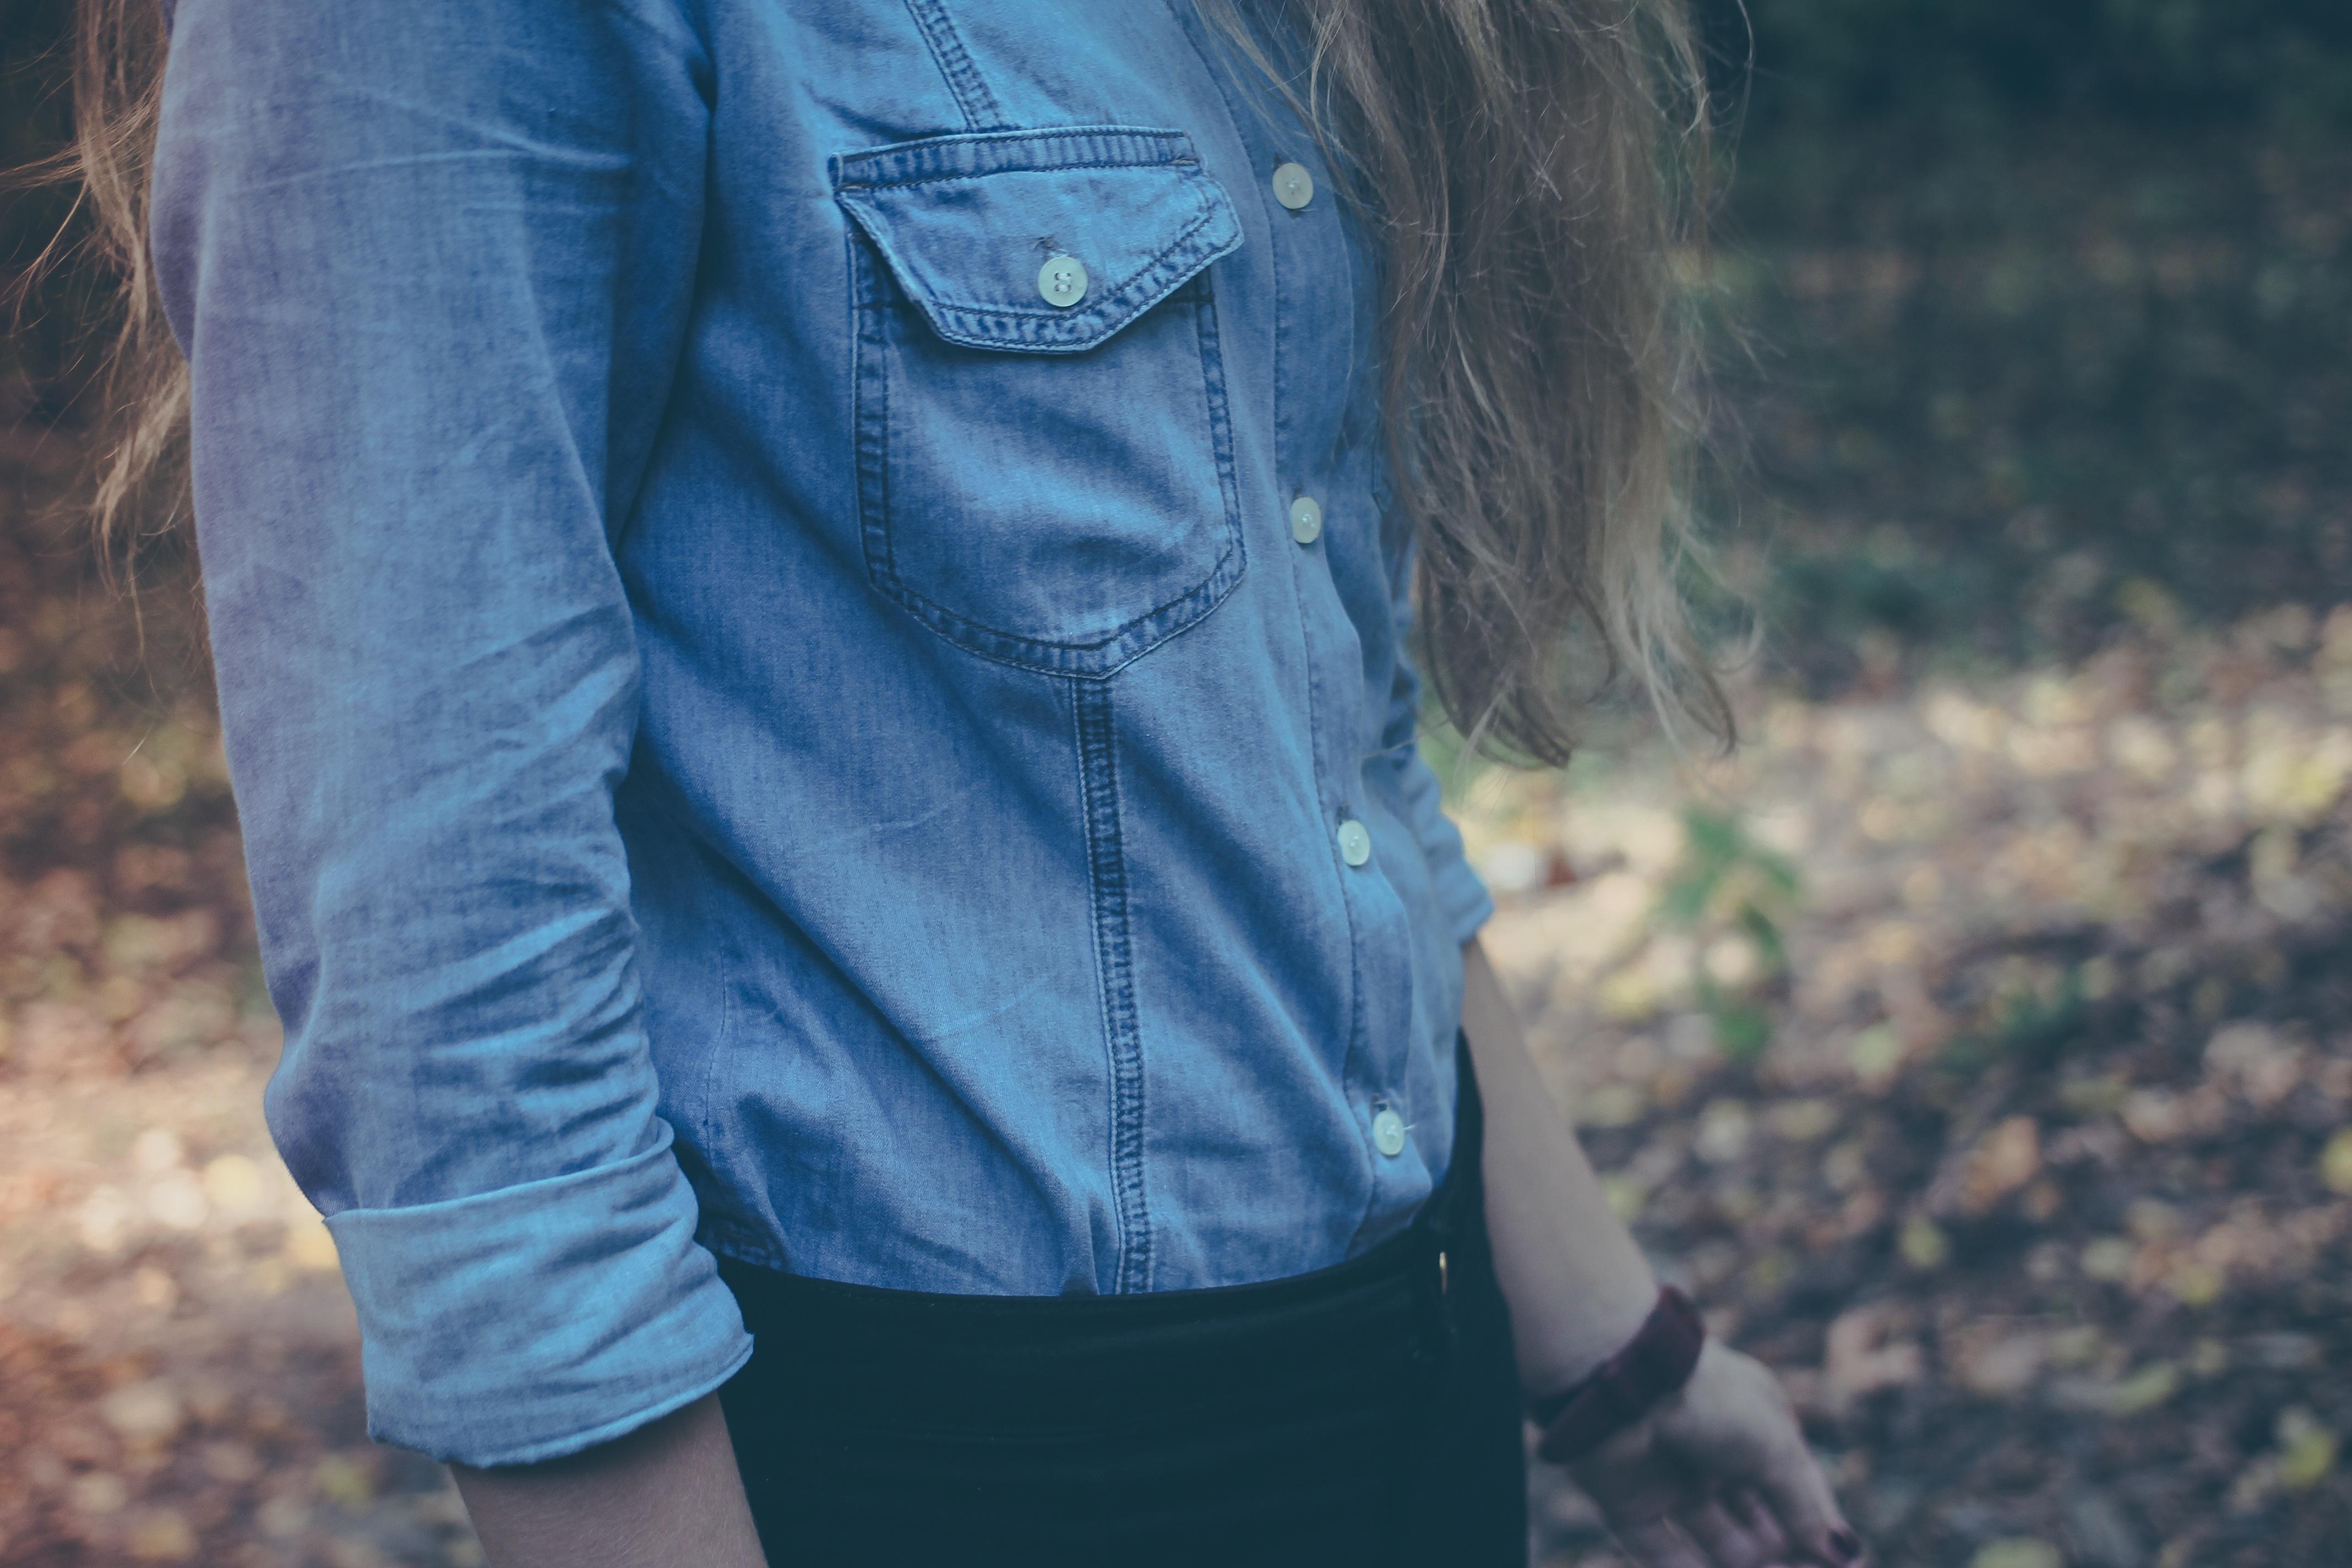 Free Images : leather, model, jeans, spring, fashion, blue ... Denim Jacket Photography